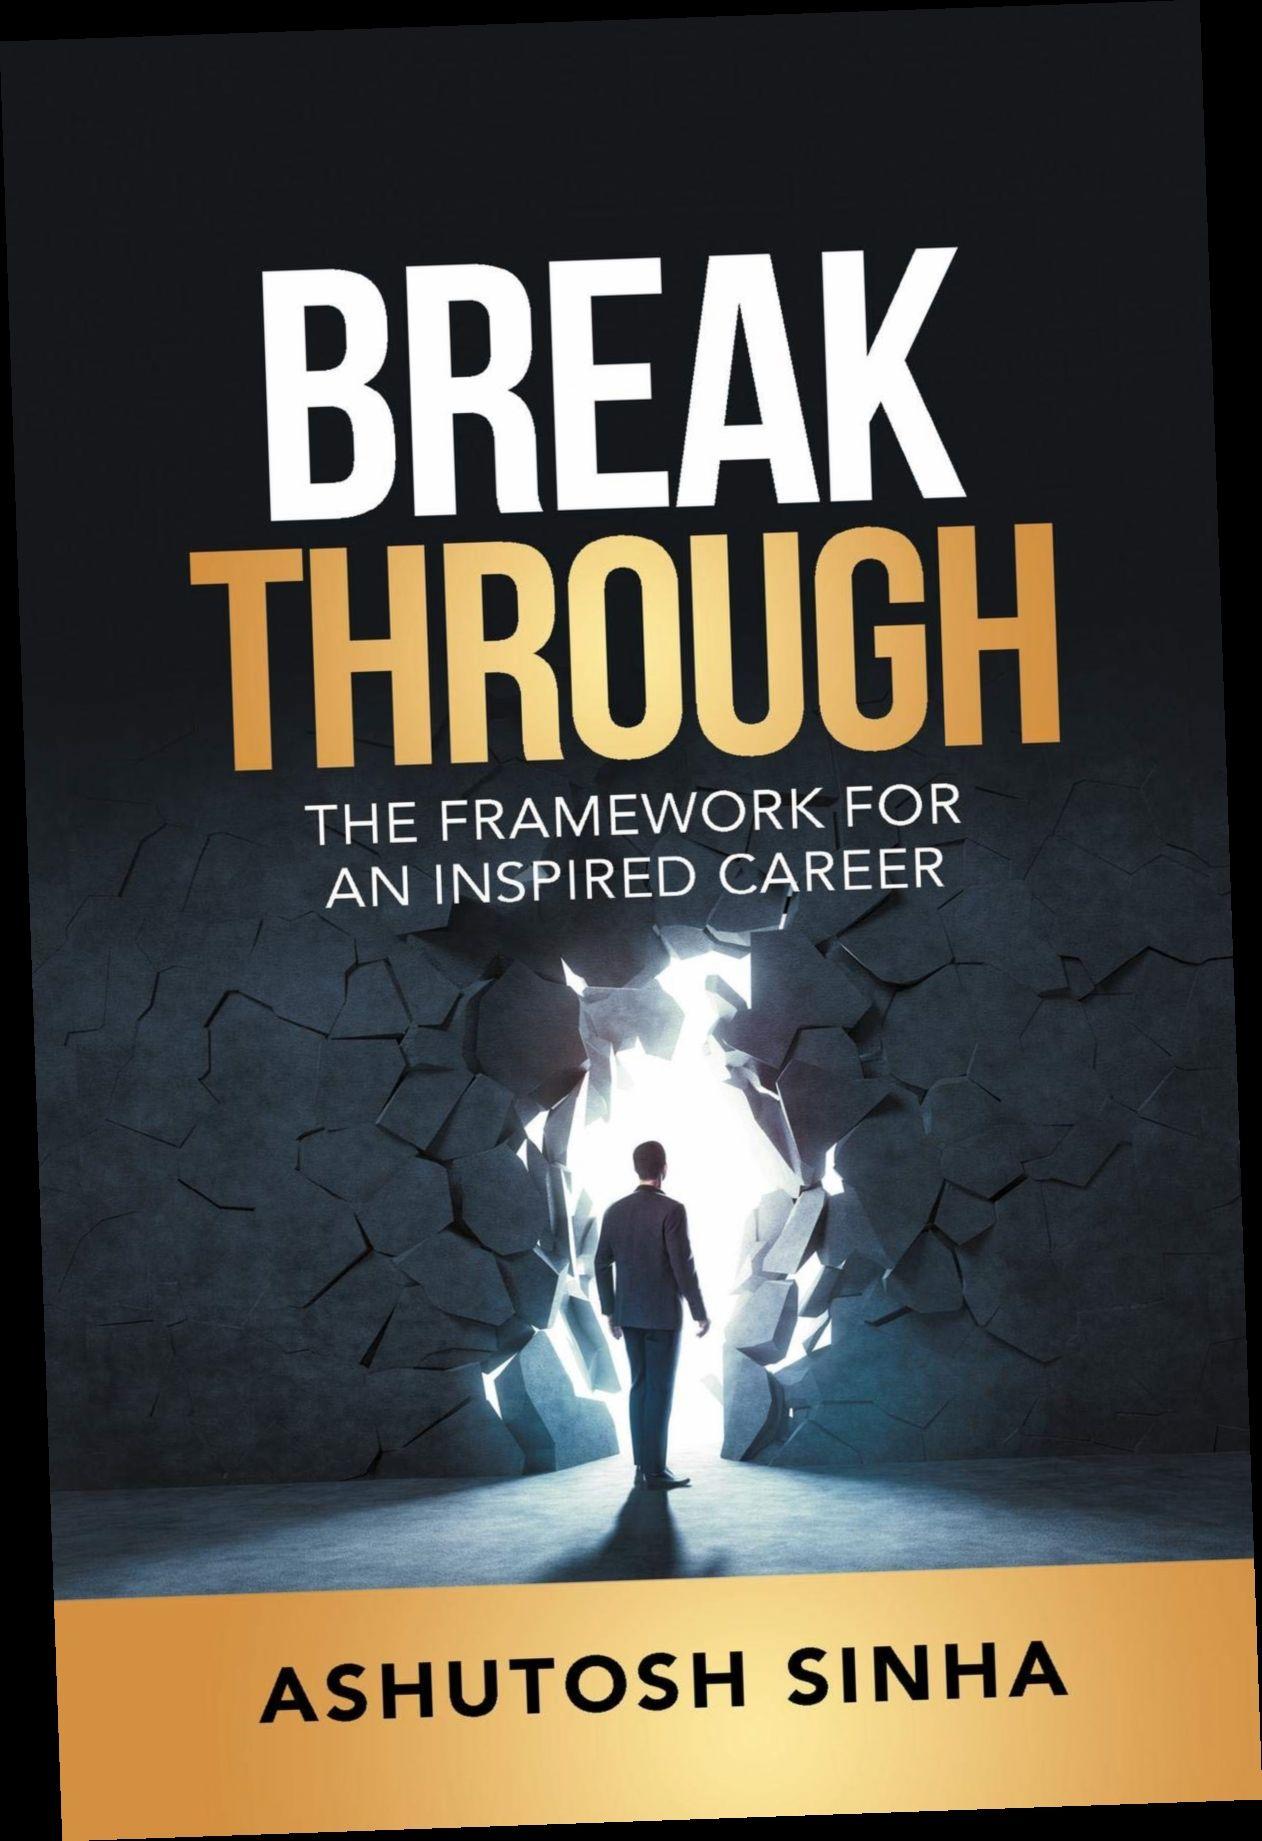 Ebook Pdf Epub Download Breakthrough The Framework For An Inspired Career By Ashutosh Sinha Ebook Ebook Pdf Breakthrough